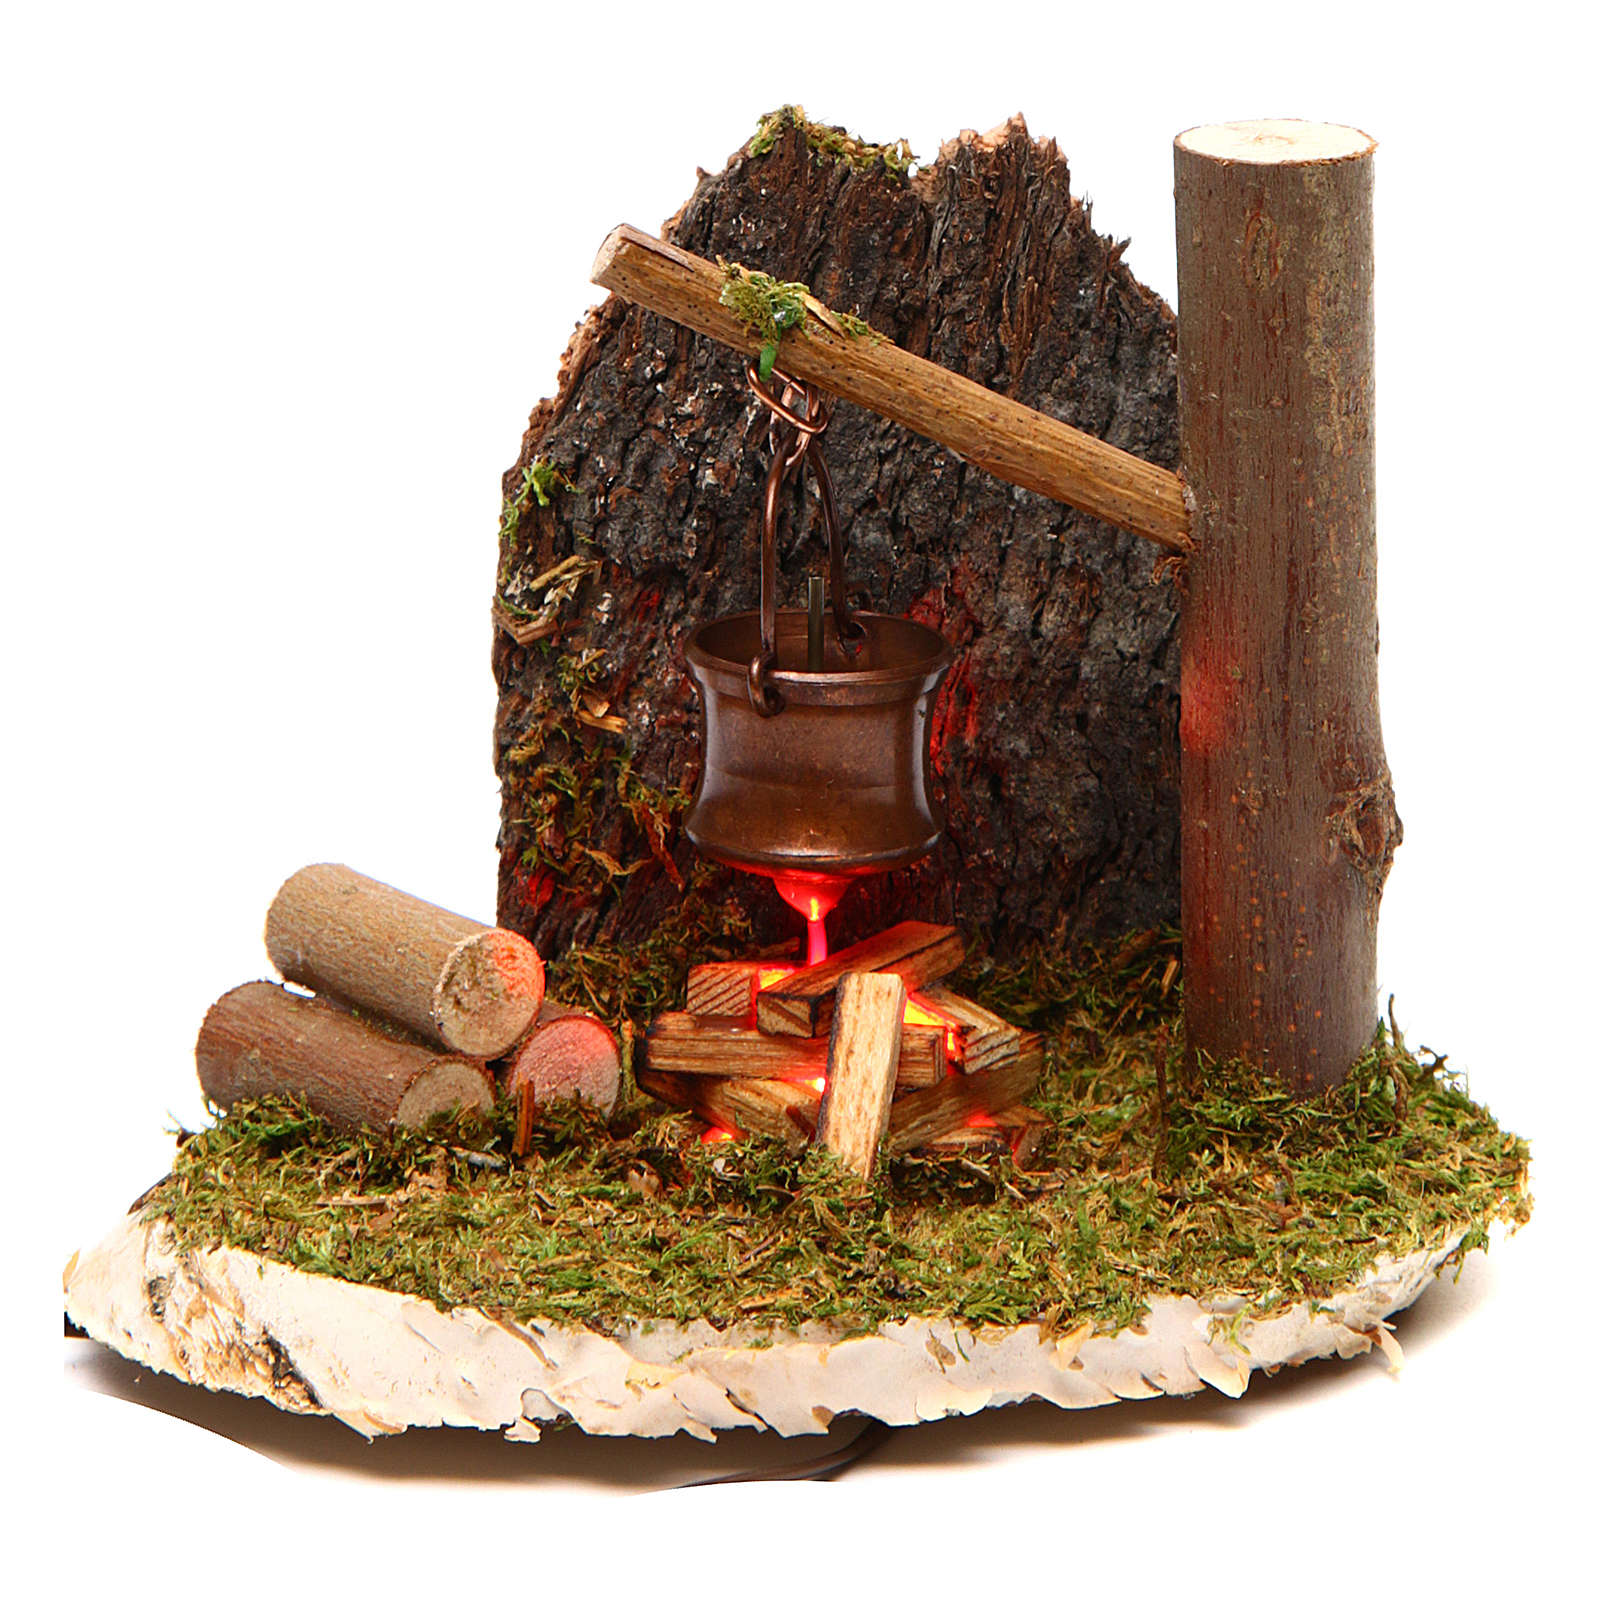 Scena pentola su fuoco rame d'albero 4,5 V 4